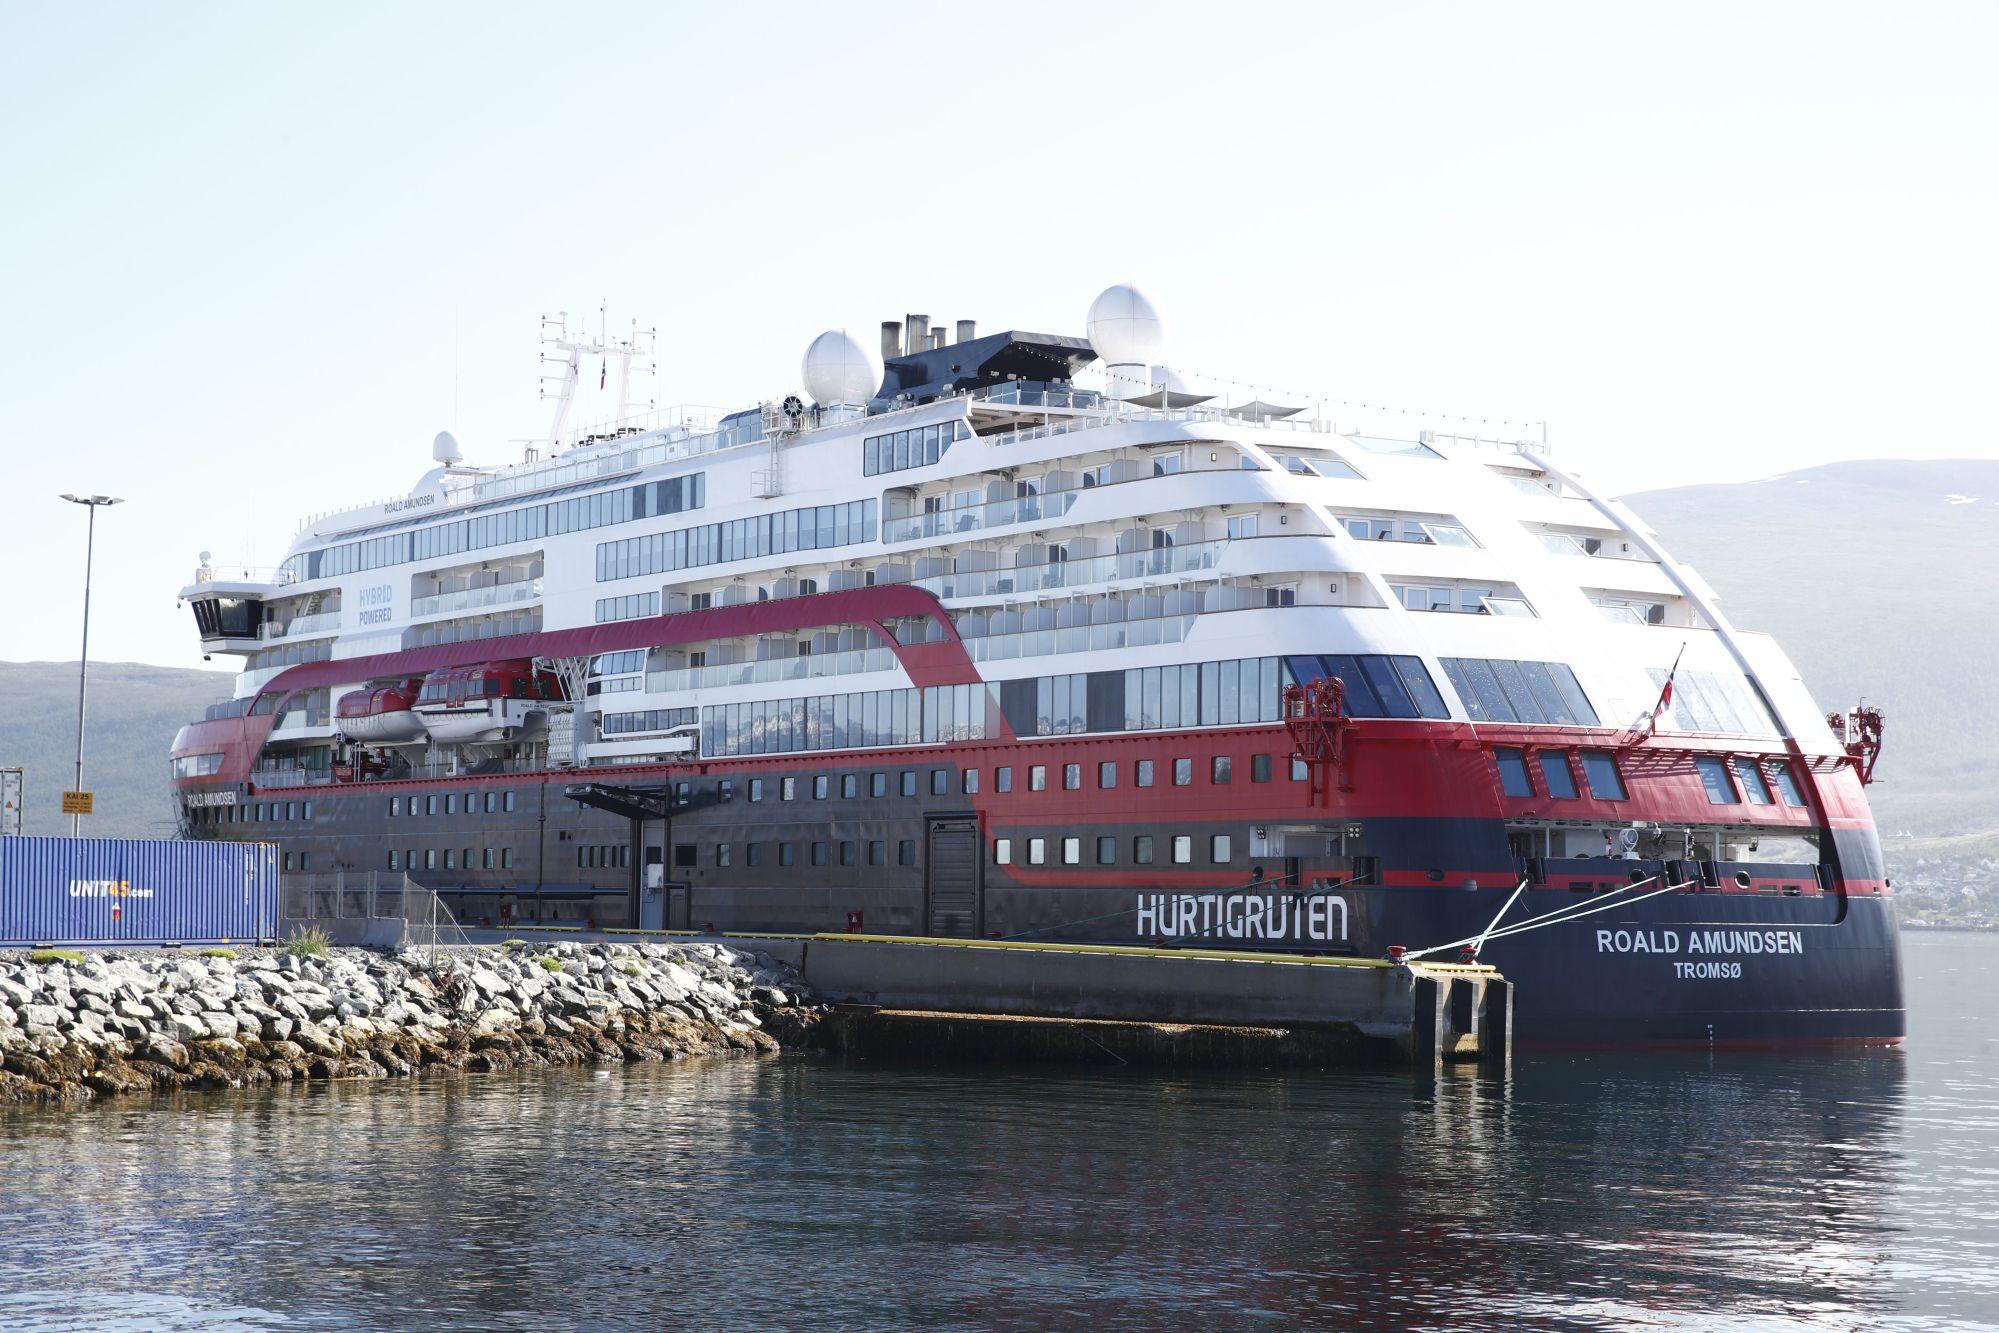 The Hurtigruten ship Roald Amundsen is moored on August 3, 2020 in Breivika, in Tromsø, northern Norway, following an outbreak of the novel coronavirus (Covid-19)on board the ship. (TERJE PEDERSEN/NTB Scanpix/AFP via Getty Images)